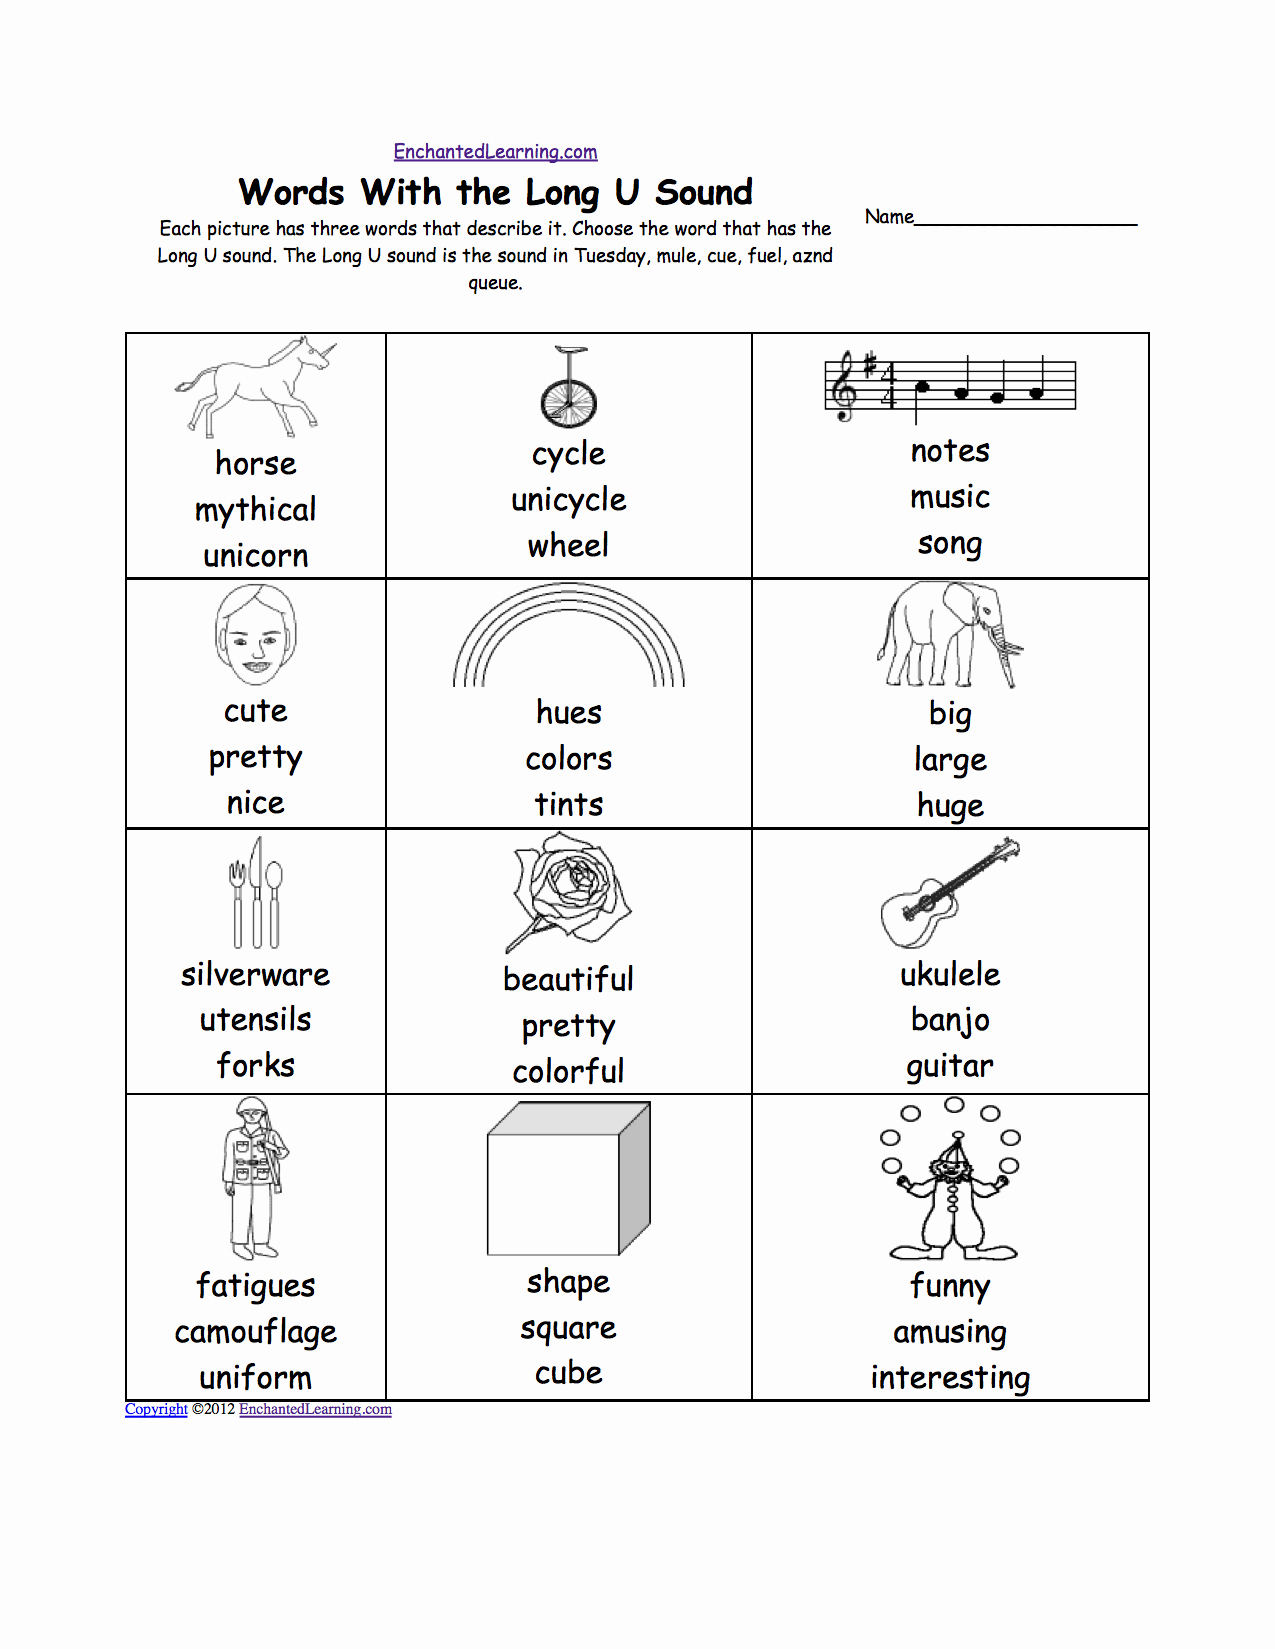 Long U sound Worksheet Elegant Long U Alphabet Activities at Enchantedlearning